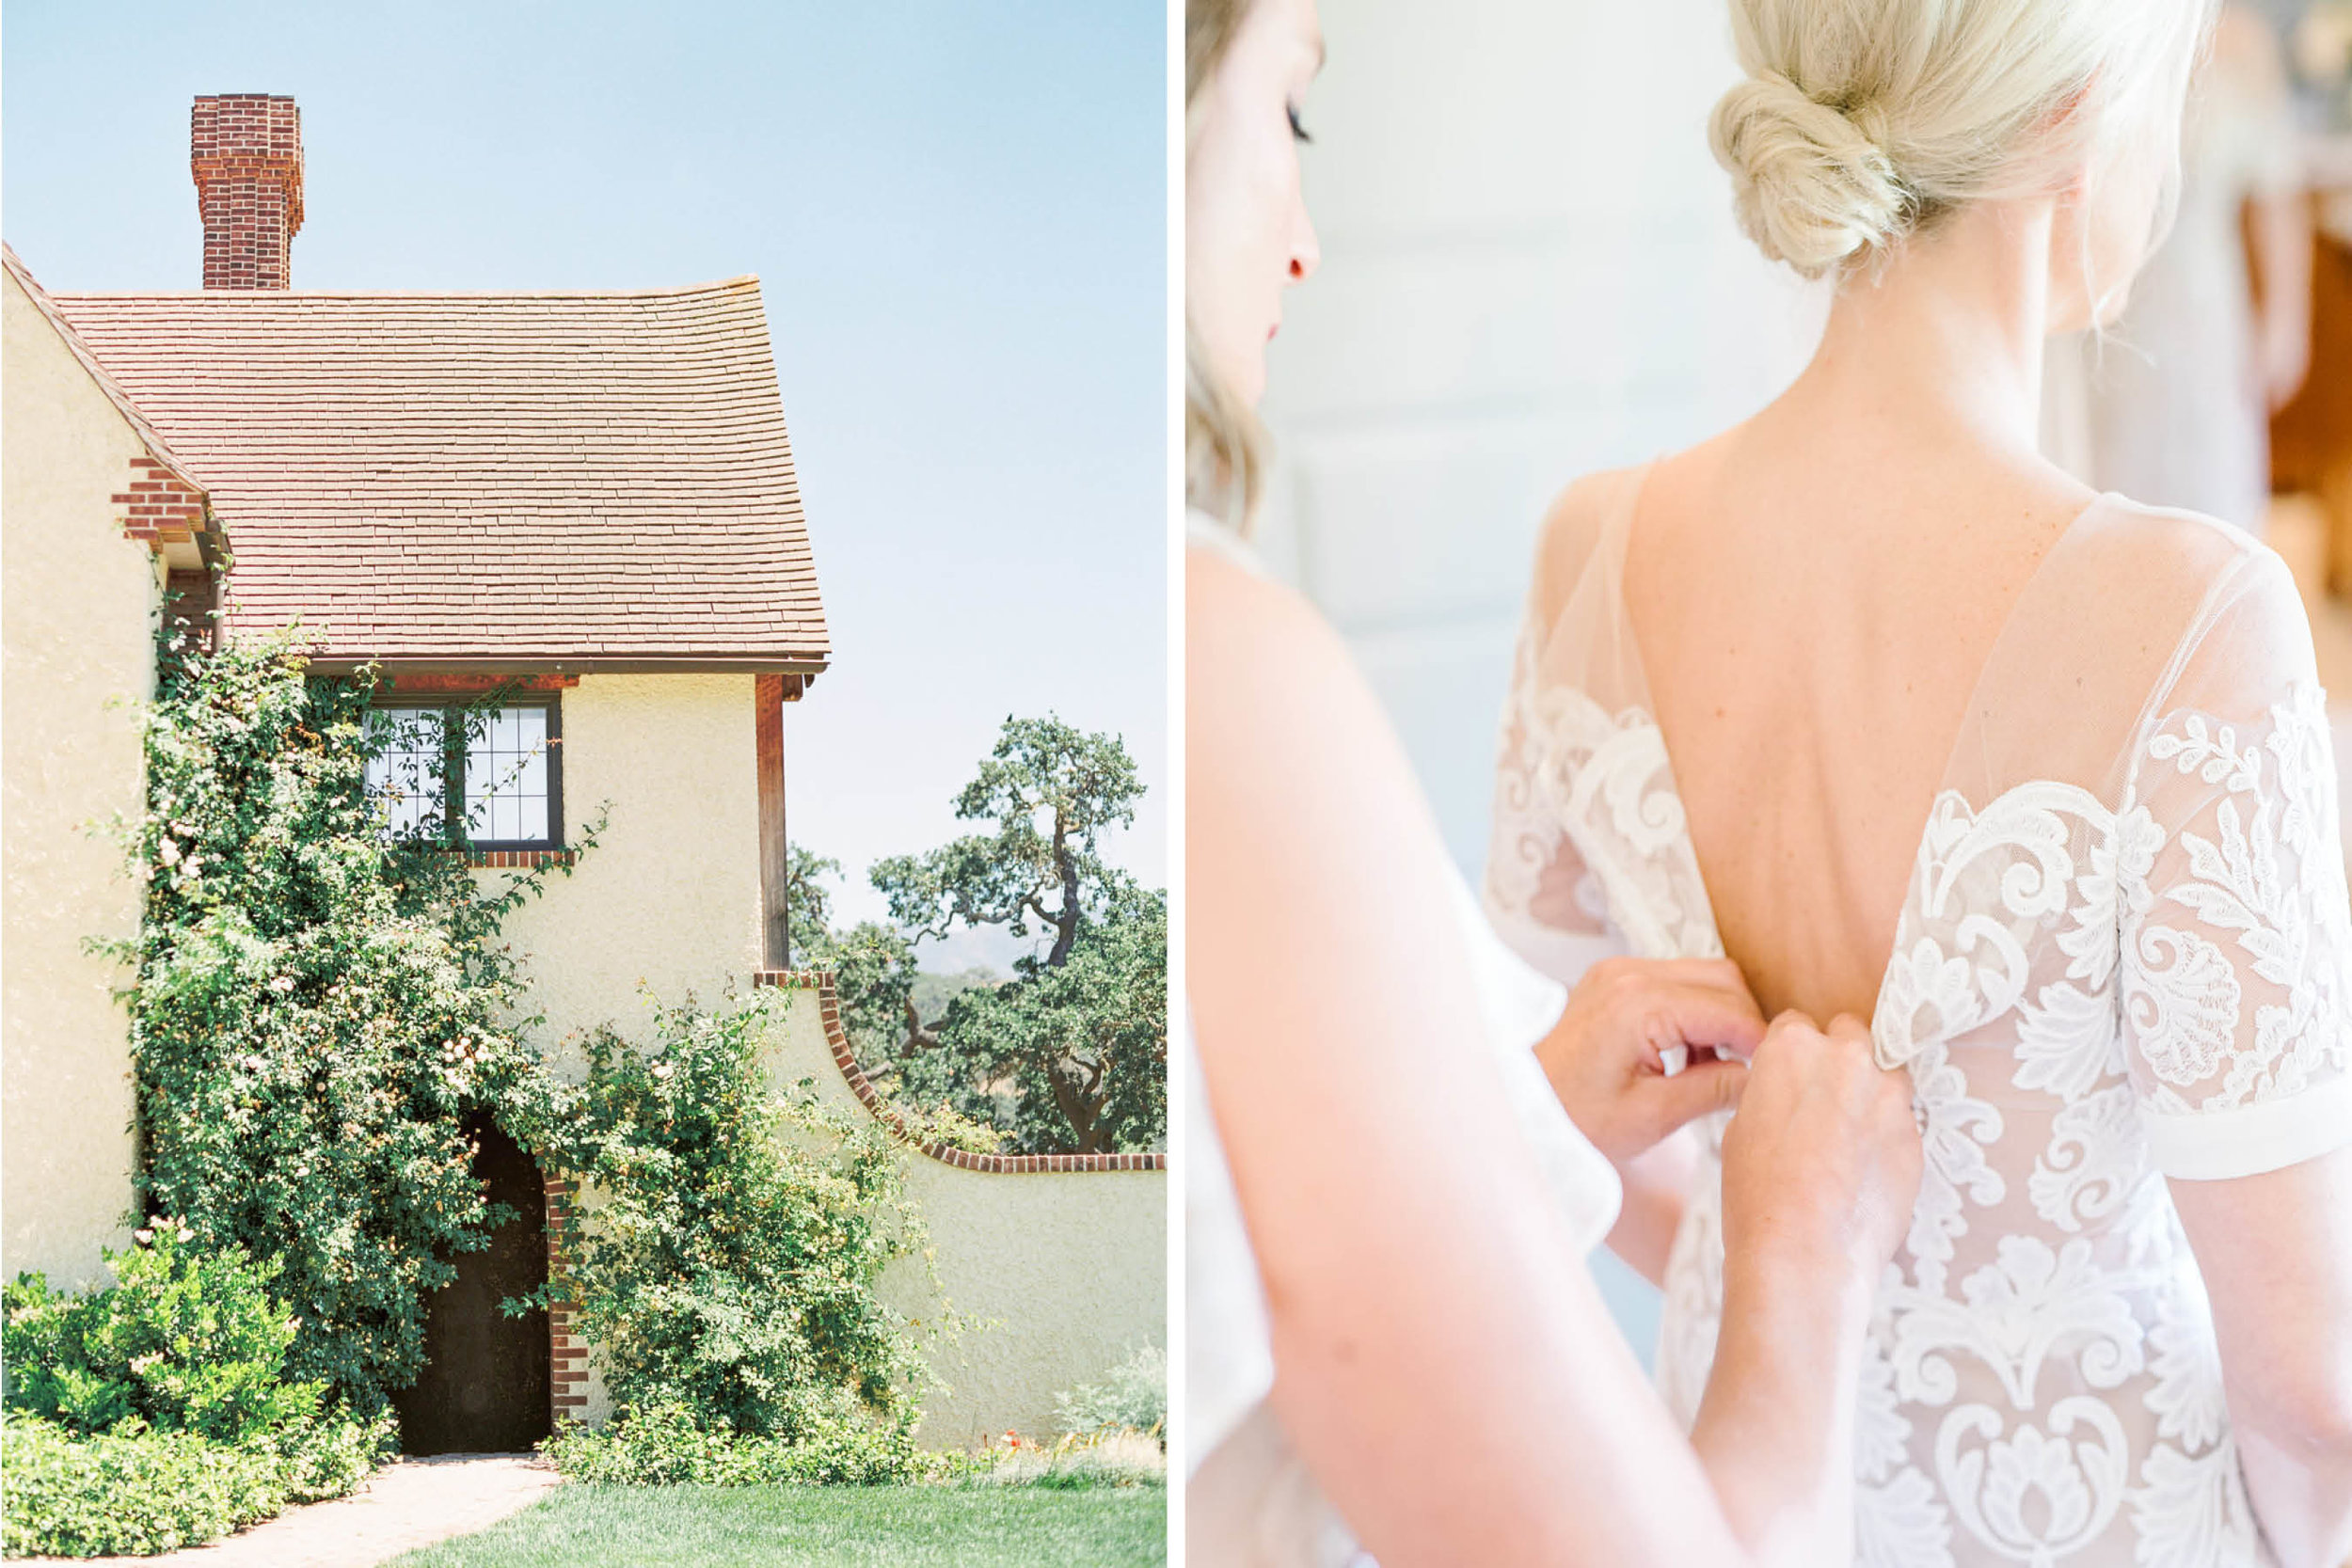 alegria-by-design-wedding-planner-planning-event-design-santa-barbara-day-of-coordinator-kestrel-park-santa-ynez-fields-castle-lavender-garden-mrs-box (5).jpg